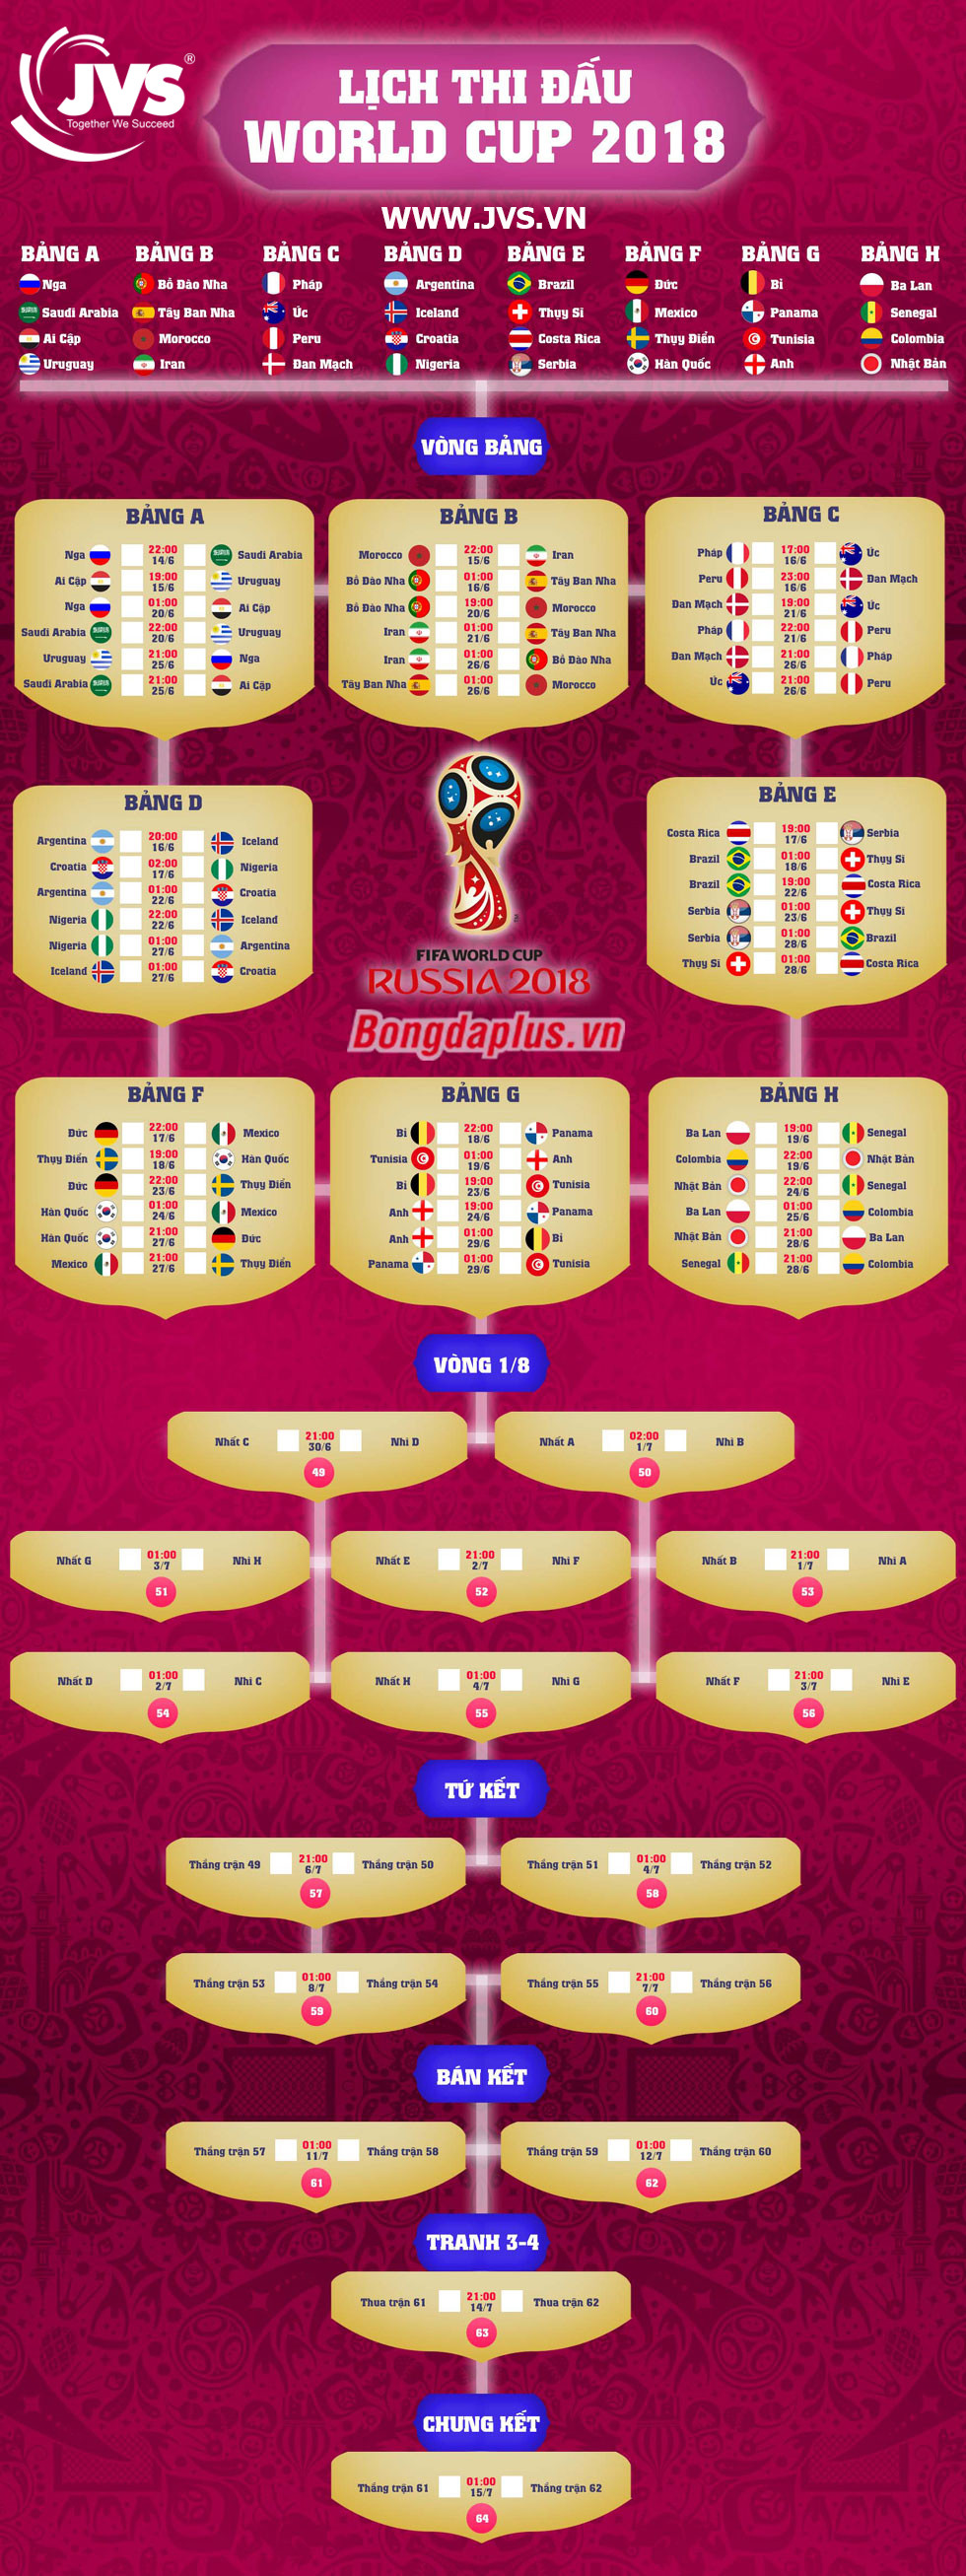 Lịch thi đấu World Cup 2018 file Excel